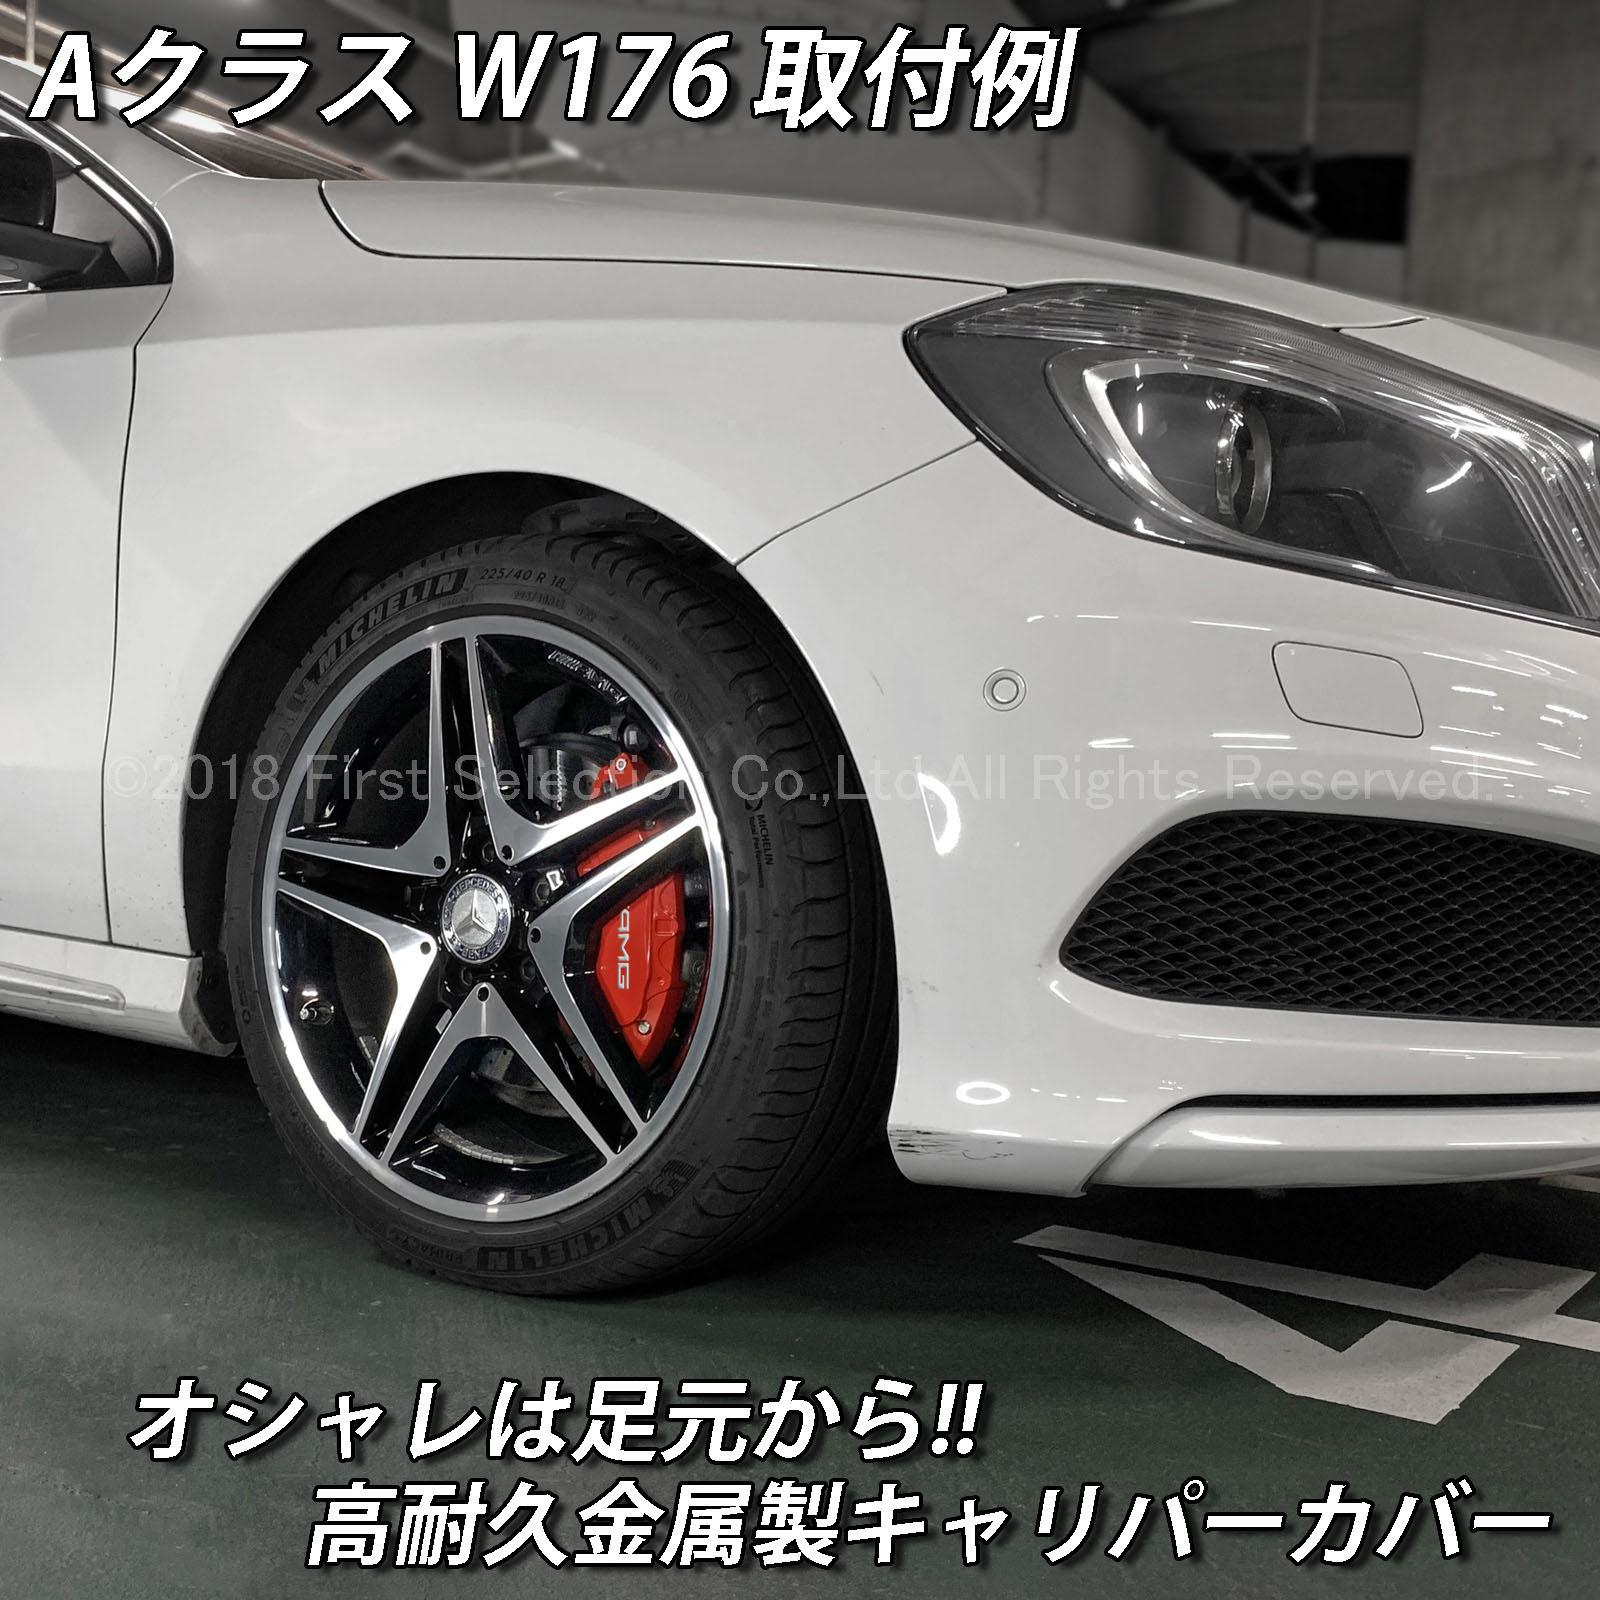 Mercedes-Benz ベンツ AMG銀文字 Aクラス W176用 高耐久金属製キャリパーカバーセット赤 W176 A180 A180スポーツ A180AMGスタイル